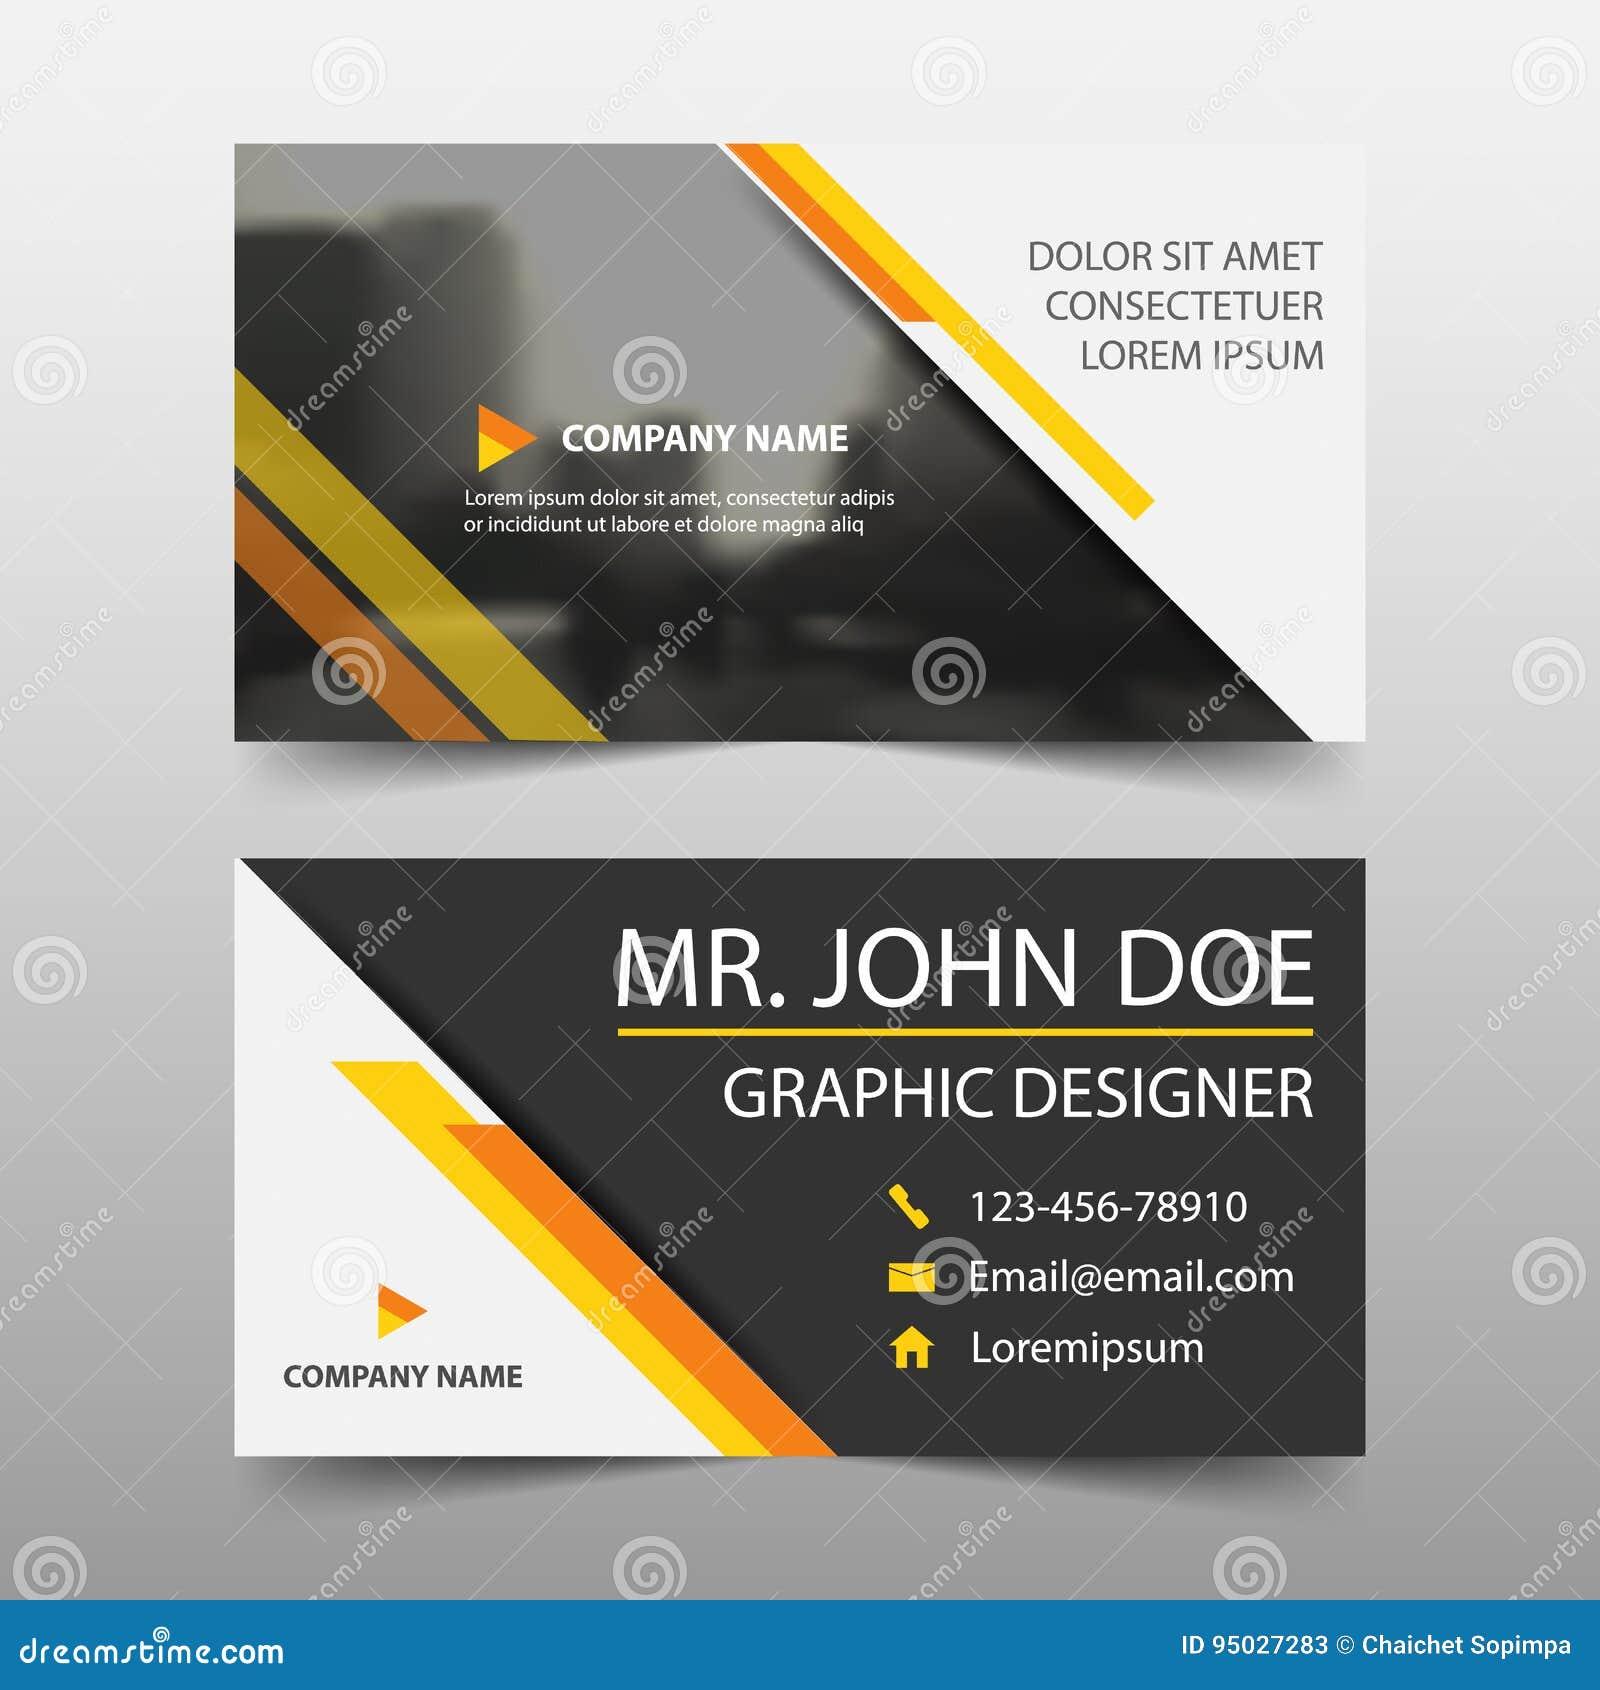 Tarjeta de visita corporativa amarilla, plantilla de la tarjeta de presentación, plantilla limpia simple horizontal del diseño de